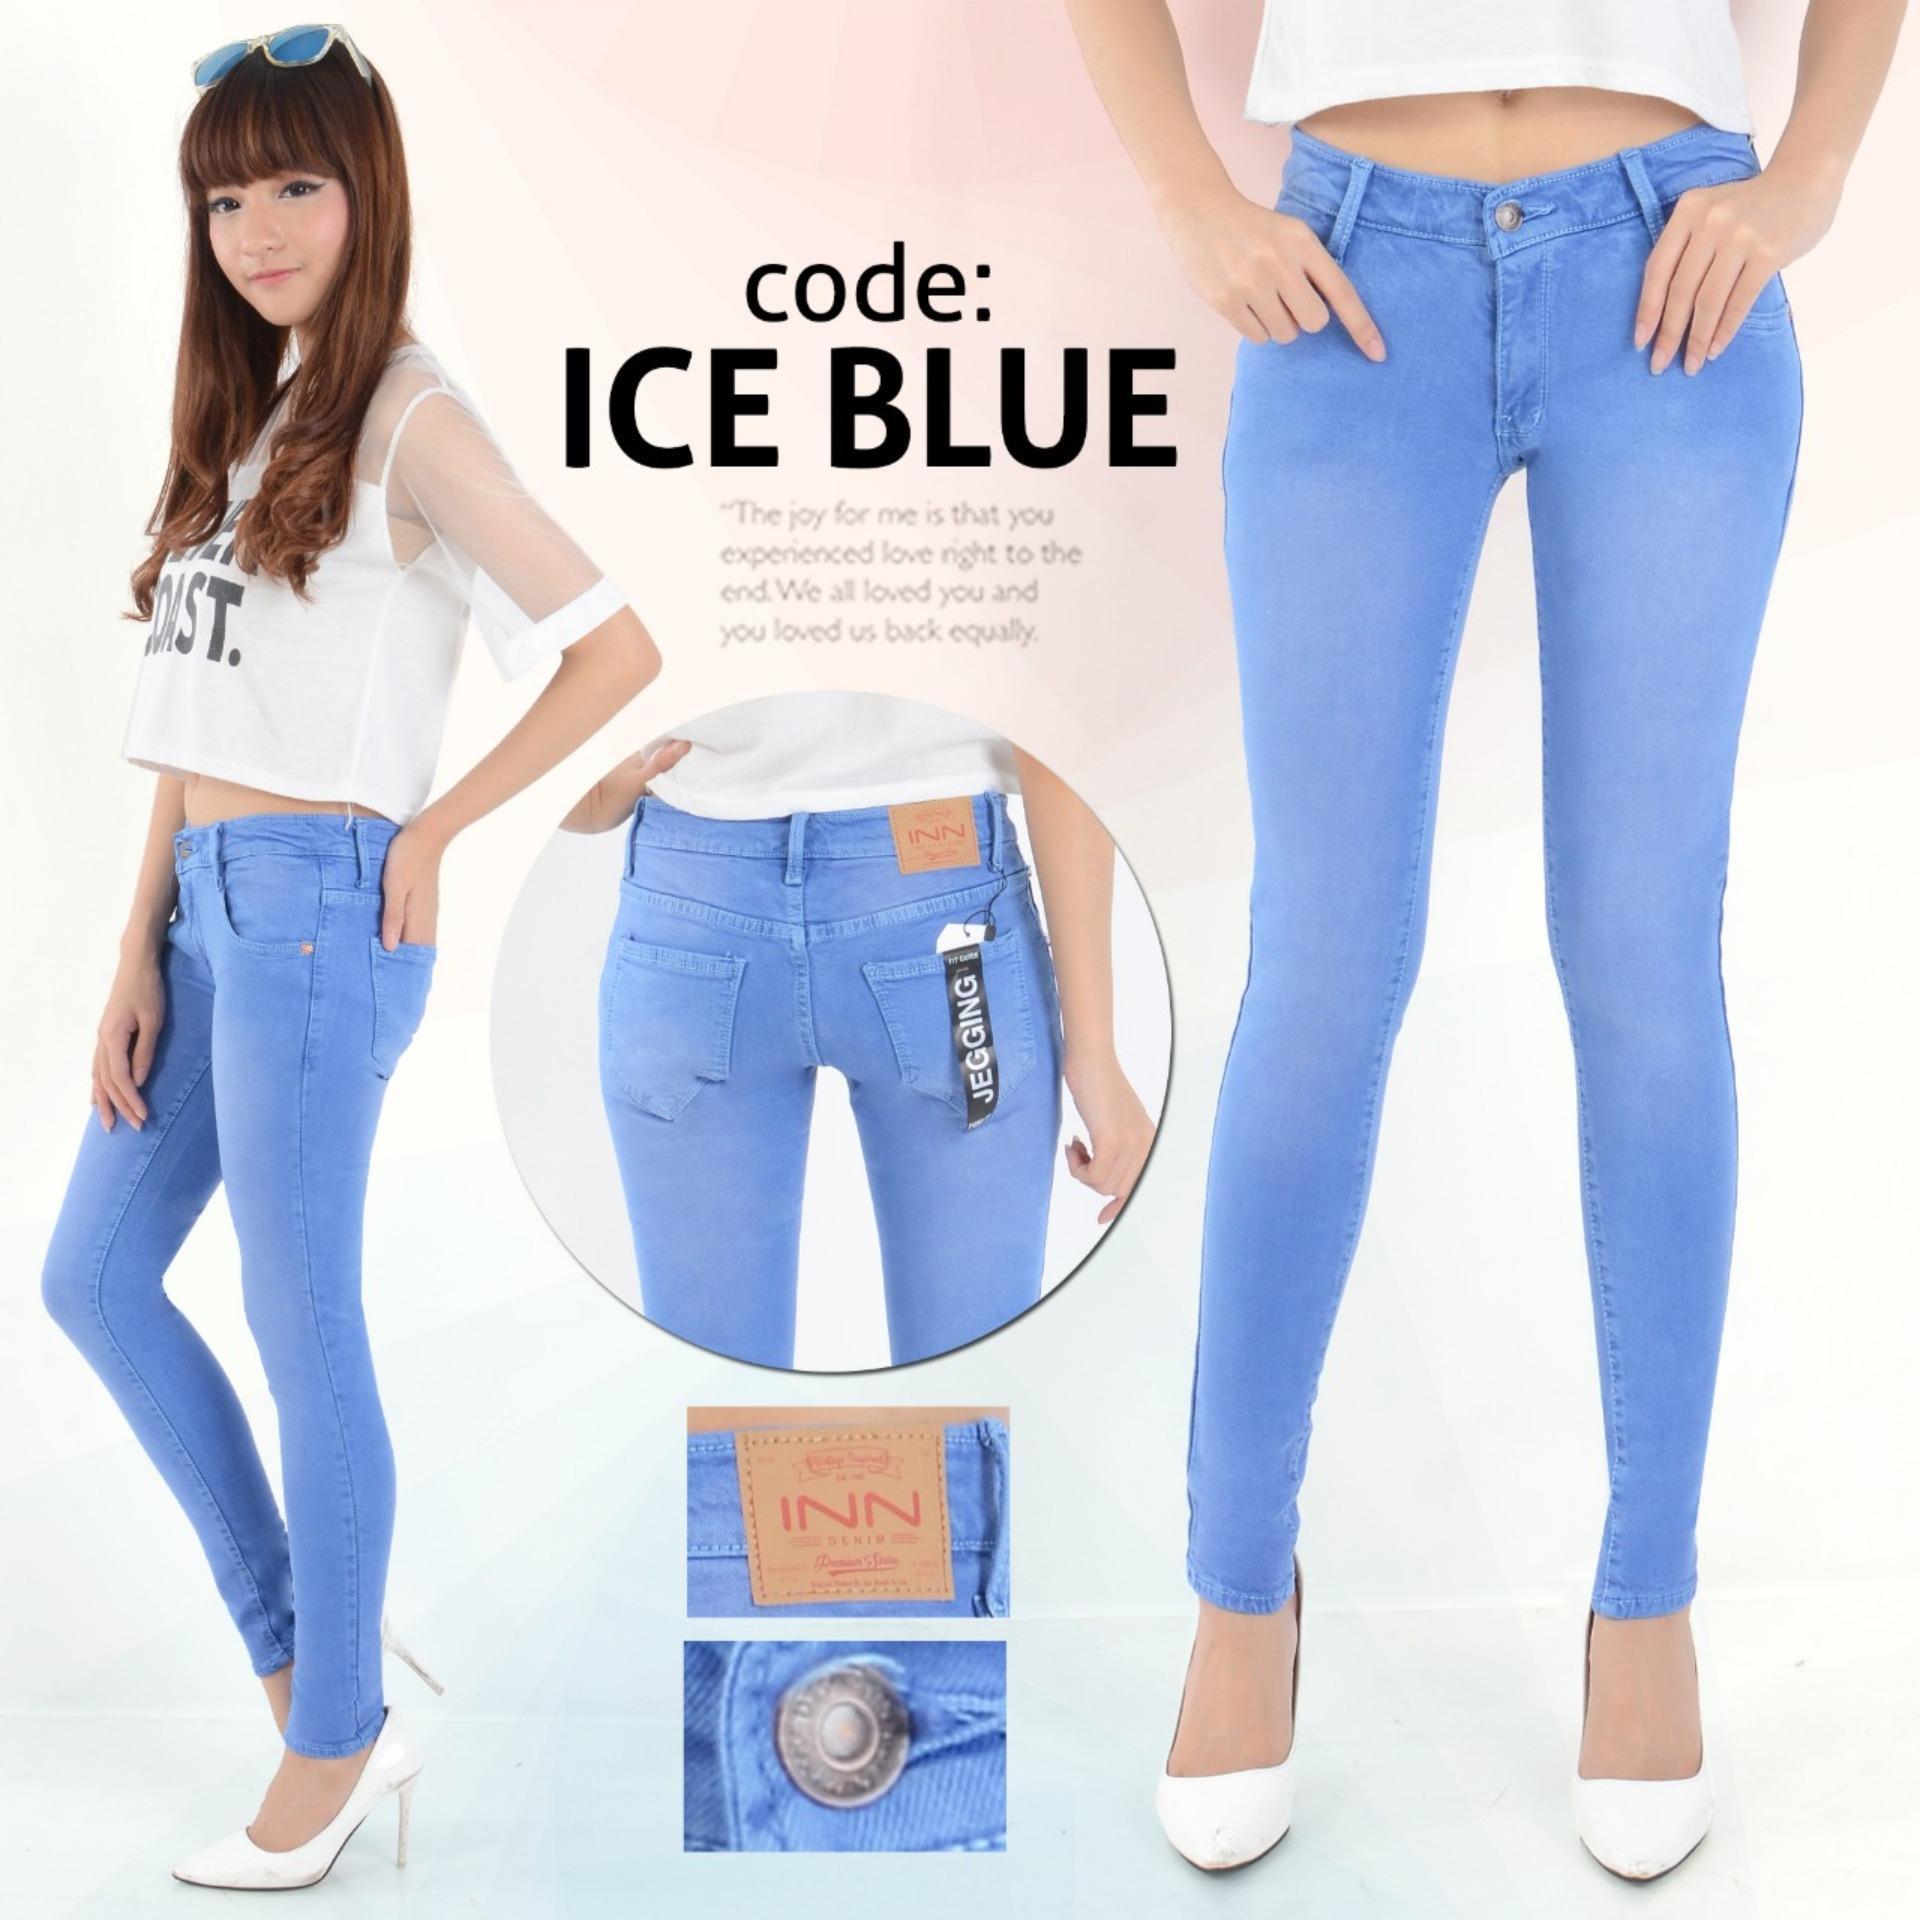 Saroha Jeans - Celana Jeans Wanita Skinny Street Berbahan Soft Jeans Street Restleting Kuat Jahitan Rapi Murah